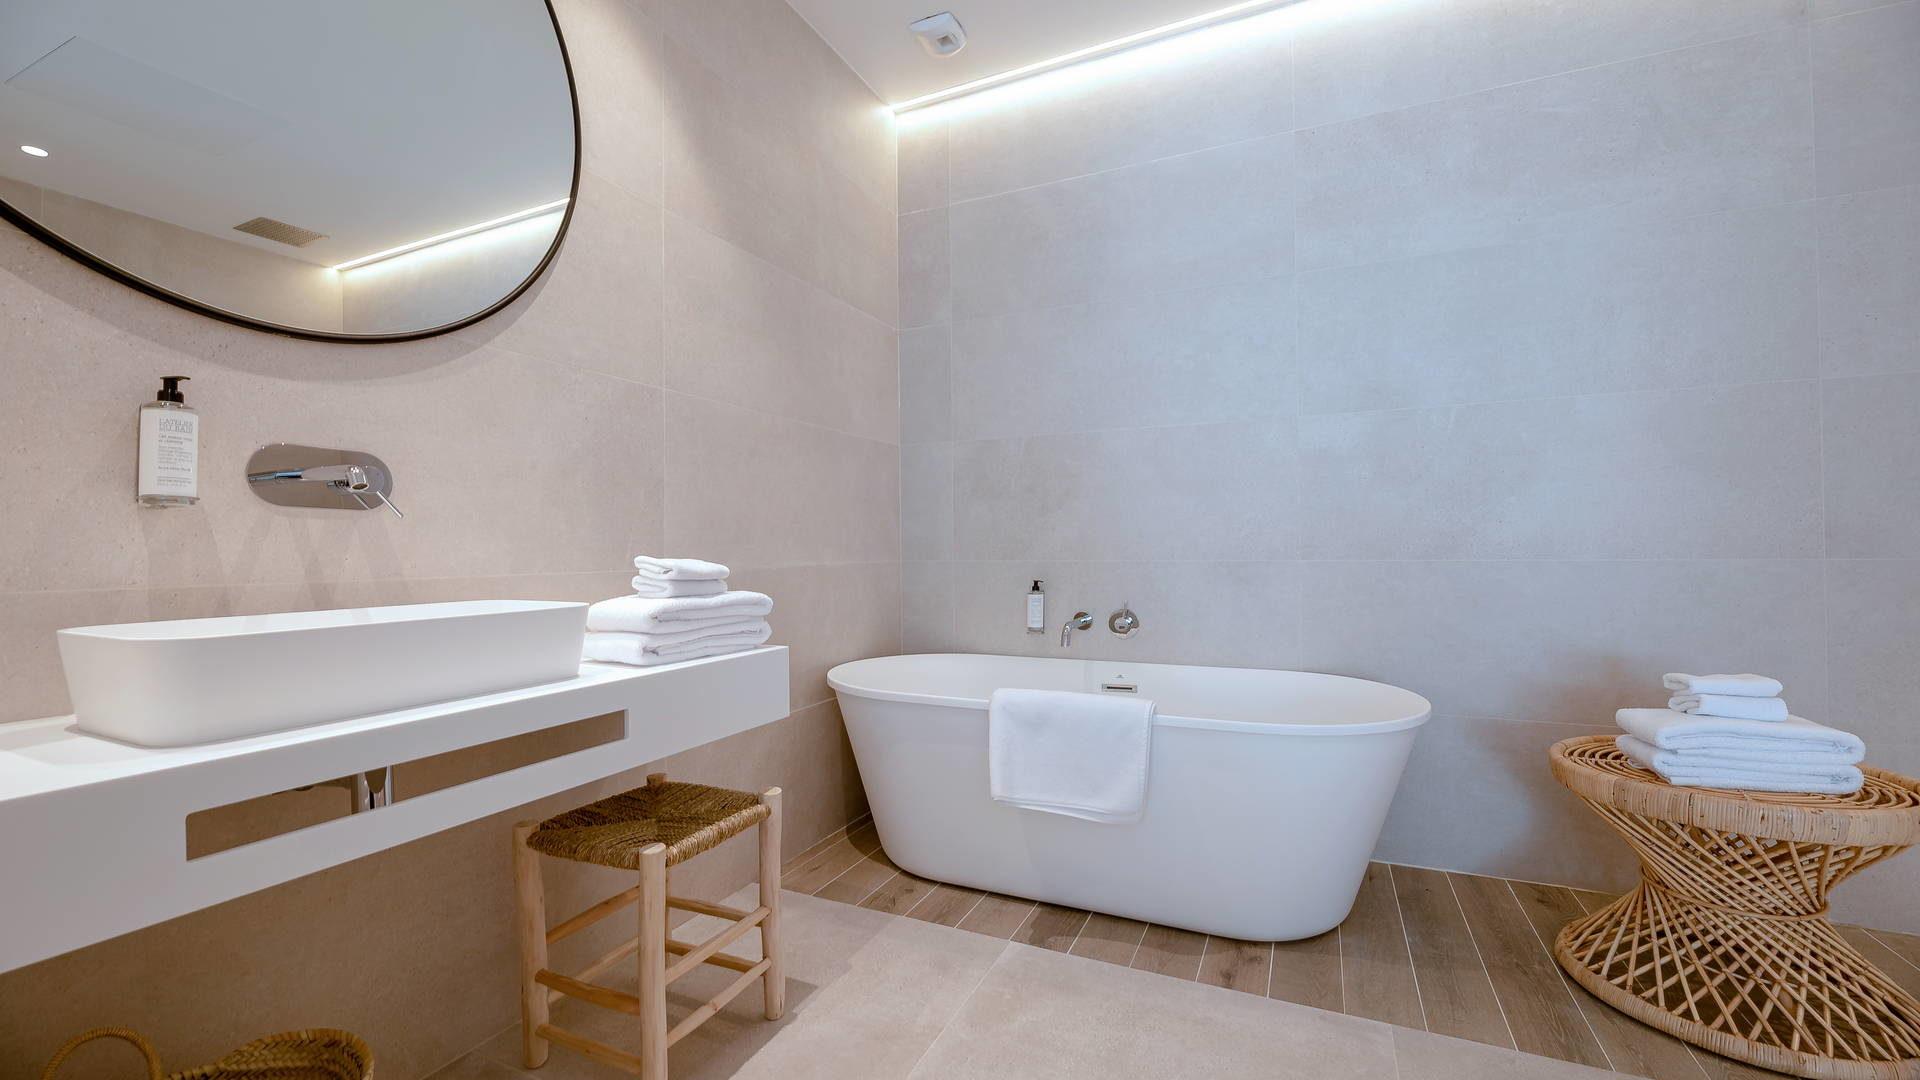 salle de bain avec baignoire hotel de charme occitanie